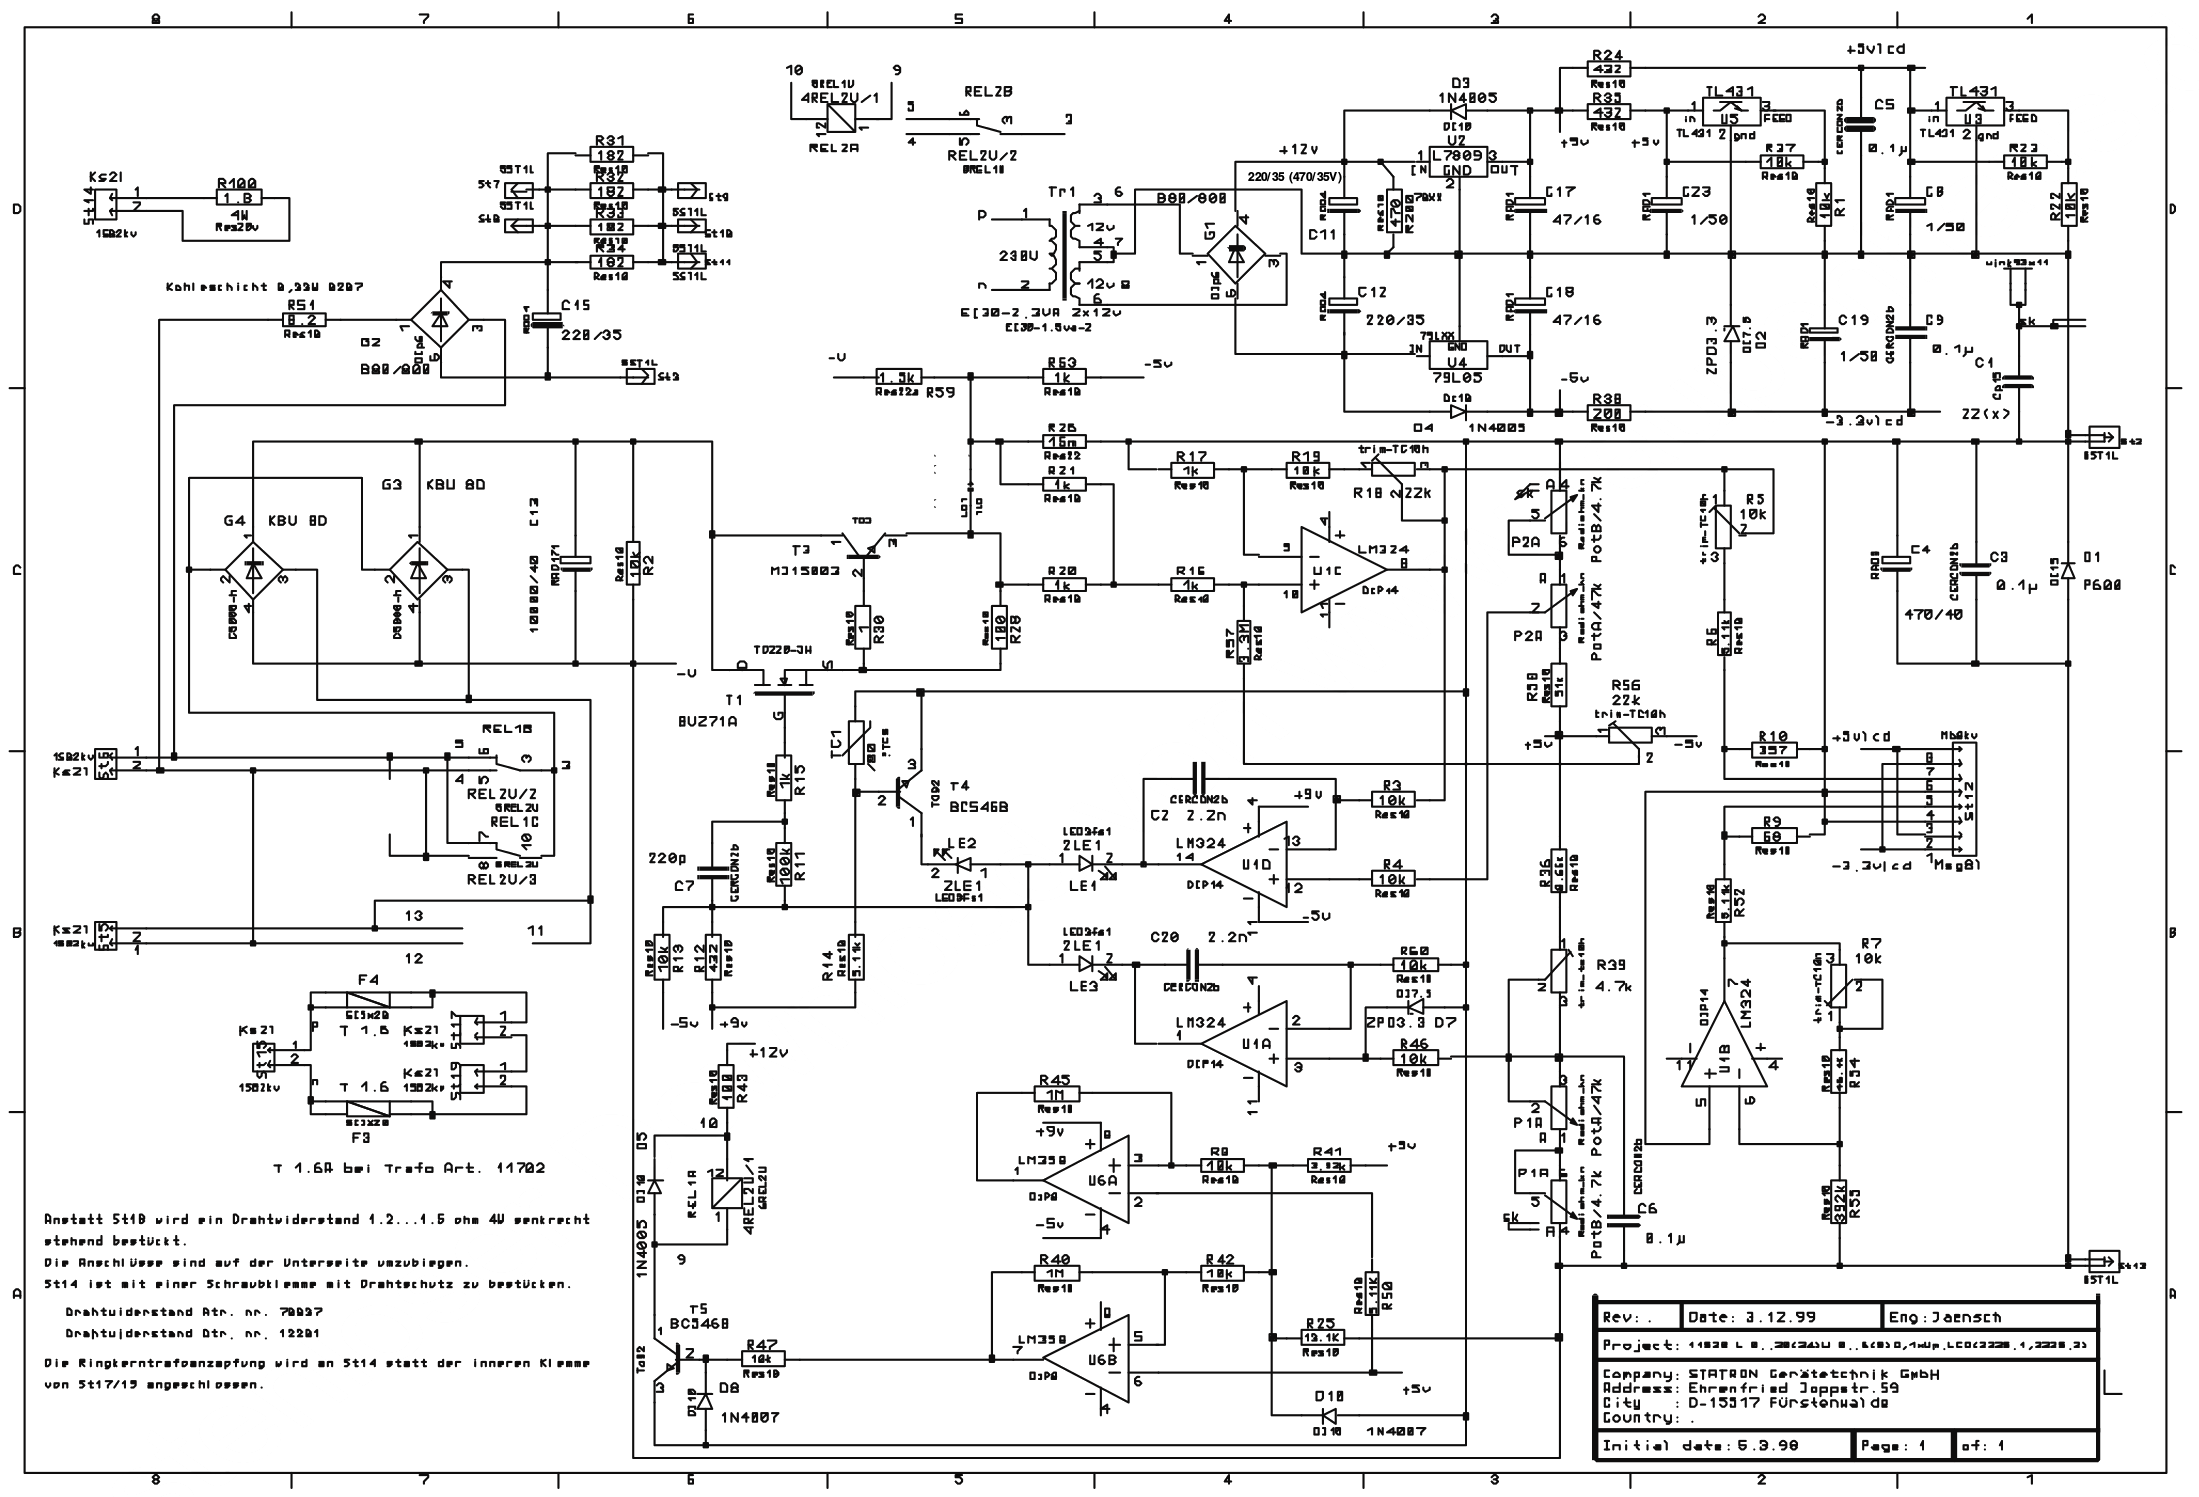 Statron Typ 2224 defekt/Schaltplan gesucht - Mikrocontroller.net